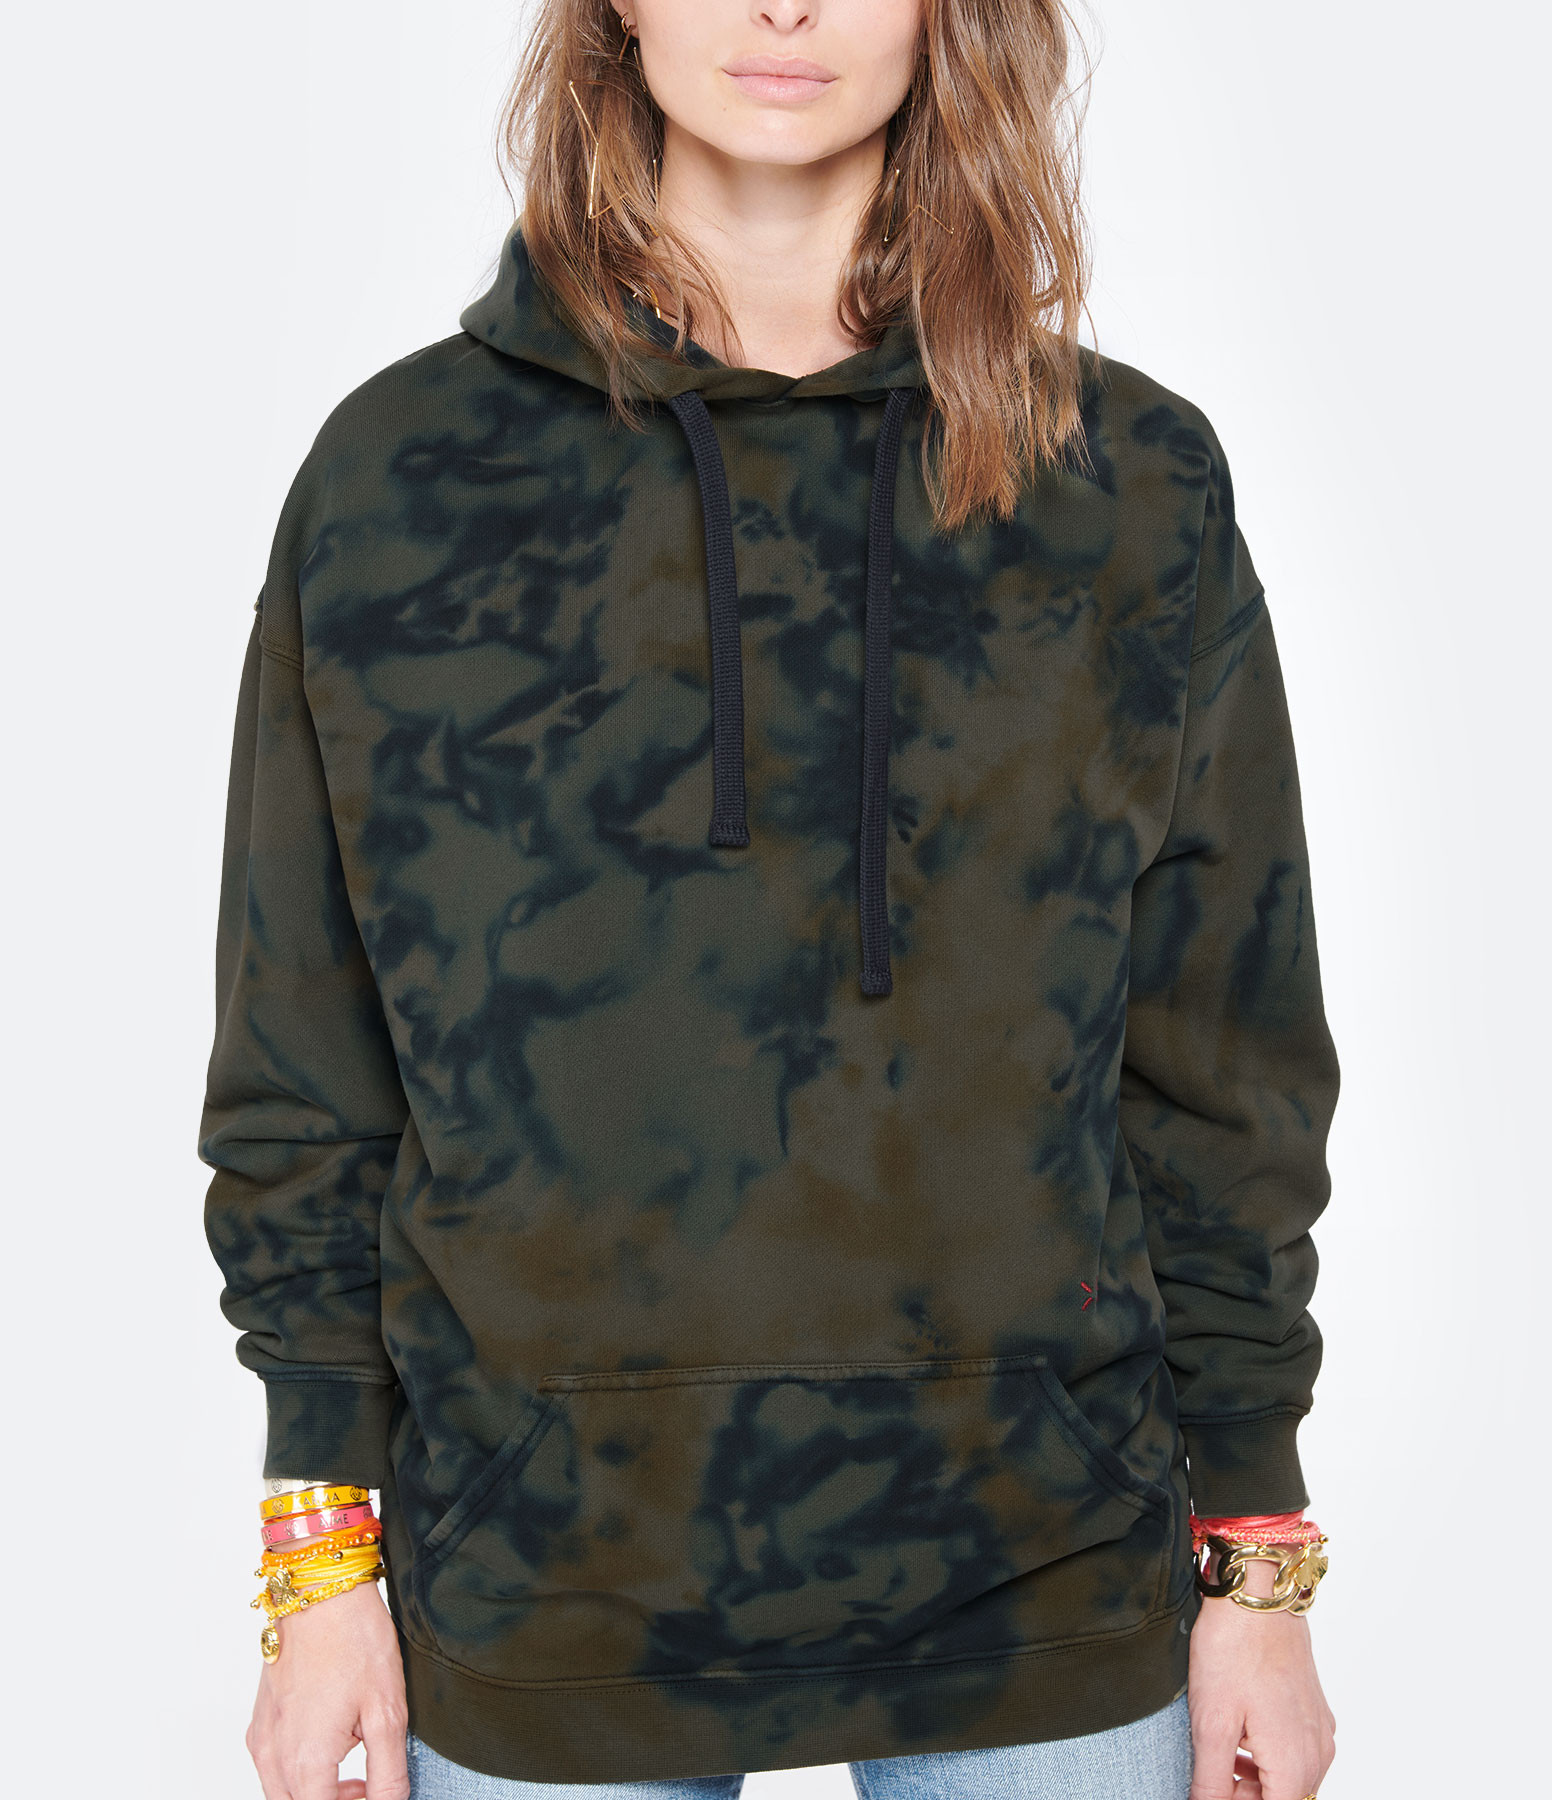 LOVE & LET DYE - Sweatshirt Malibu Coton Navy Vert Army